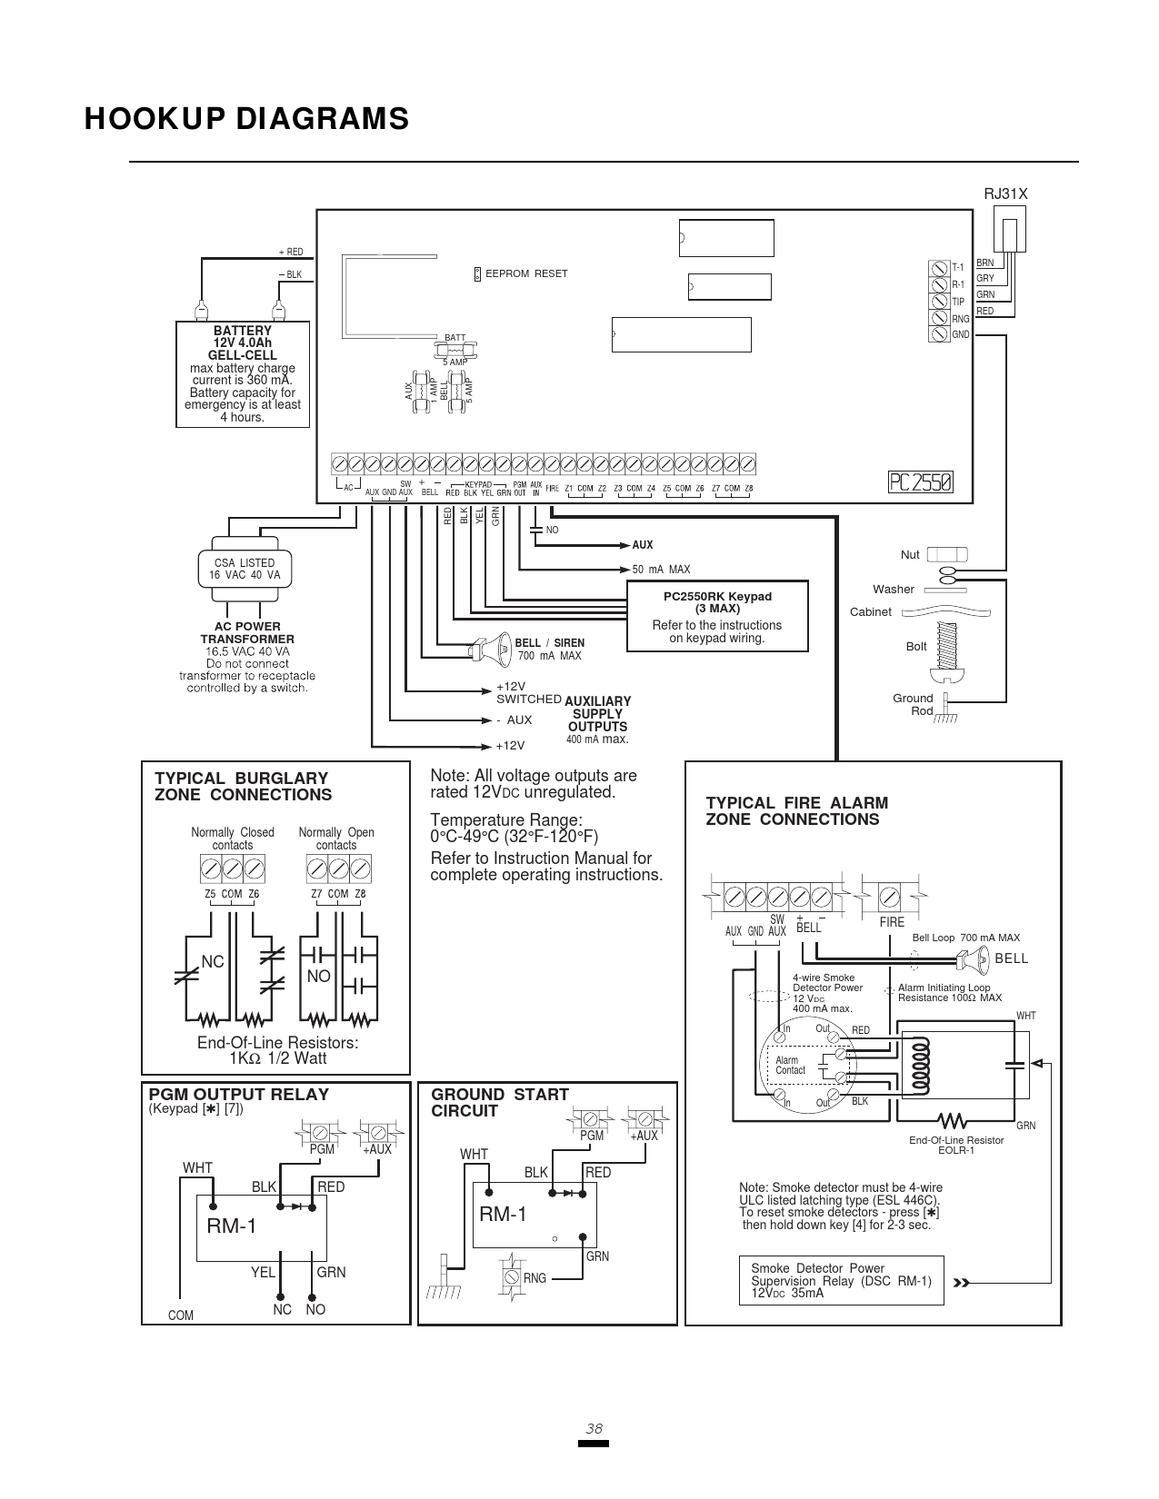 dsc keypad wiring diagram a sentence easy steps pc2550 v1 3 im eng 29000592 r2 by sertek servicios